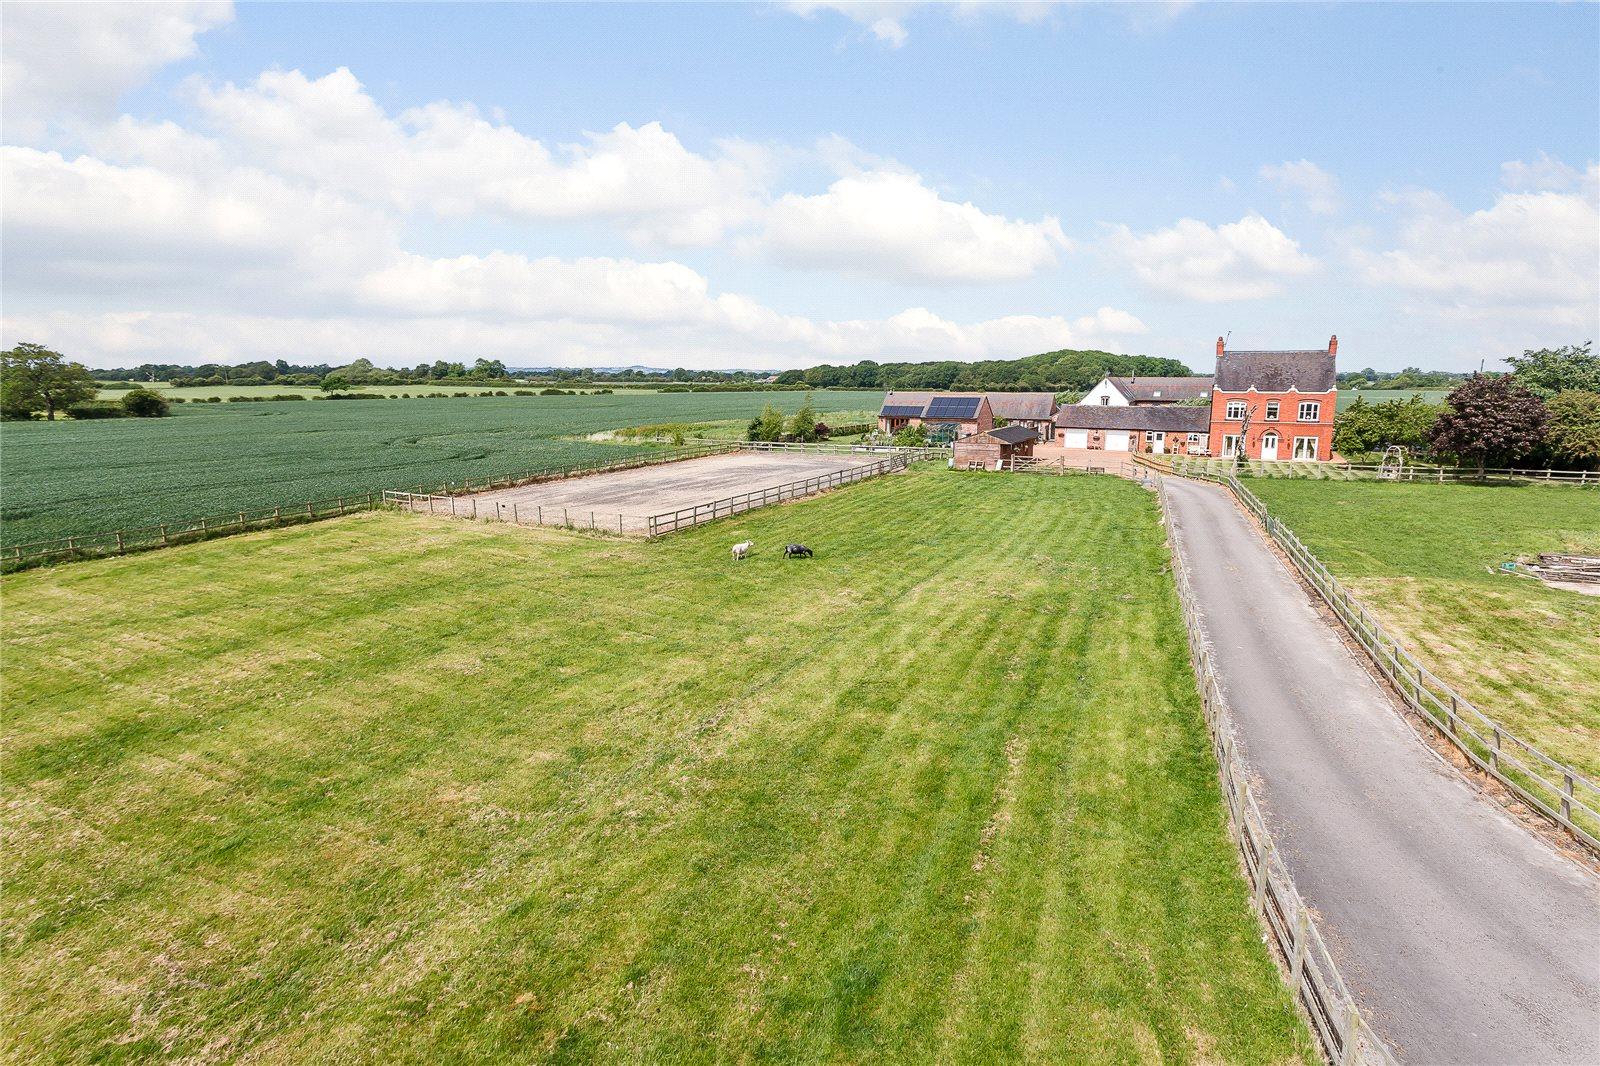 Tek Ailelik Ev için Satış at Aston Juxta Mondrum, Nantwich, Cheshire, CW5 Nantwich, Ingiltere